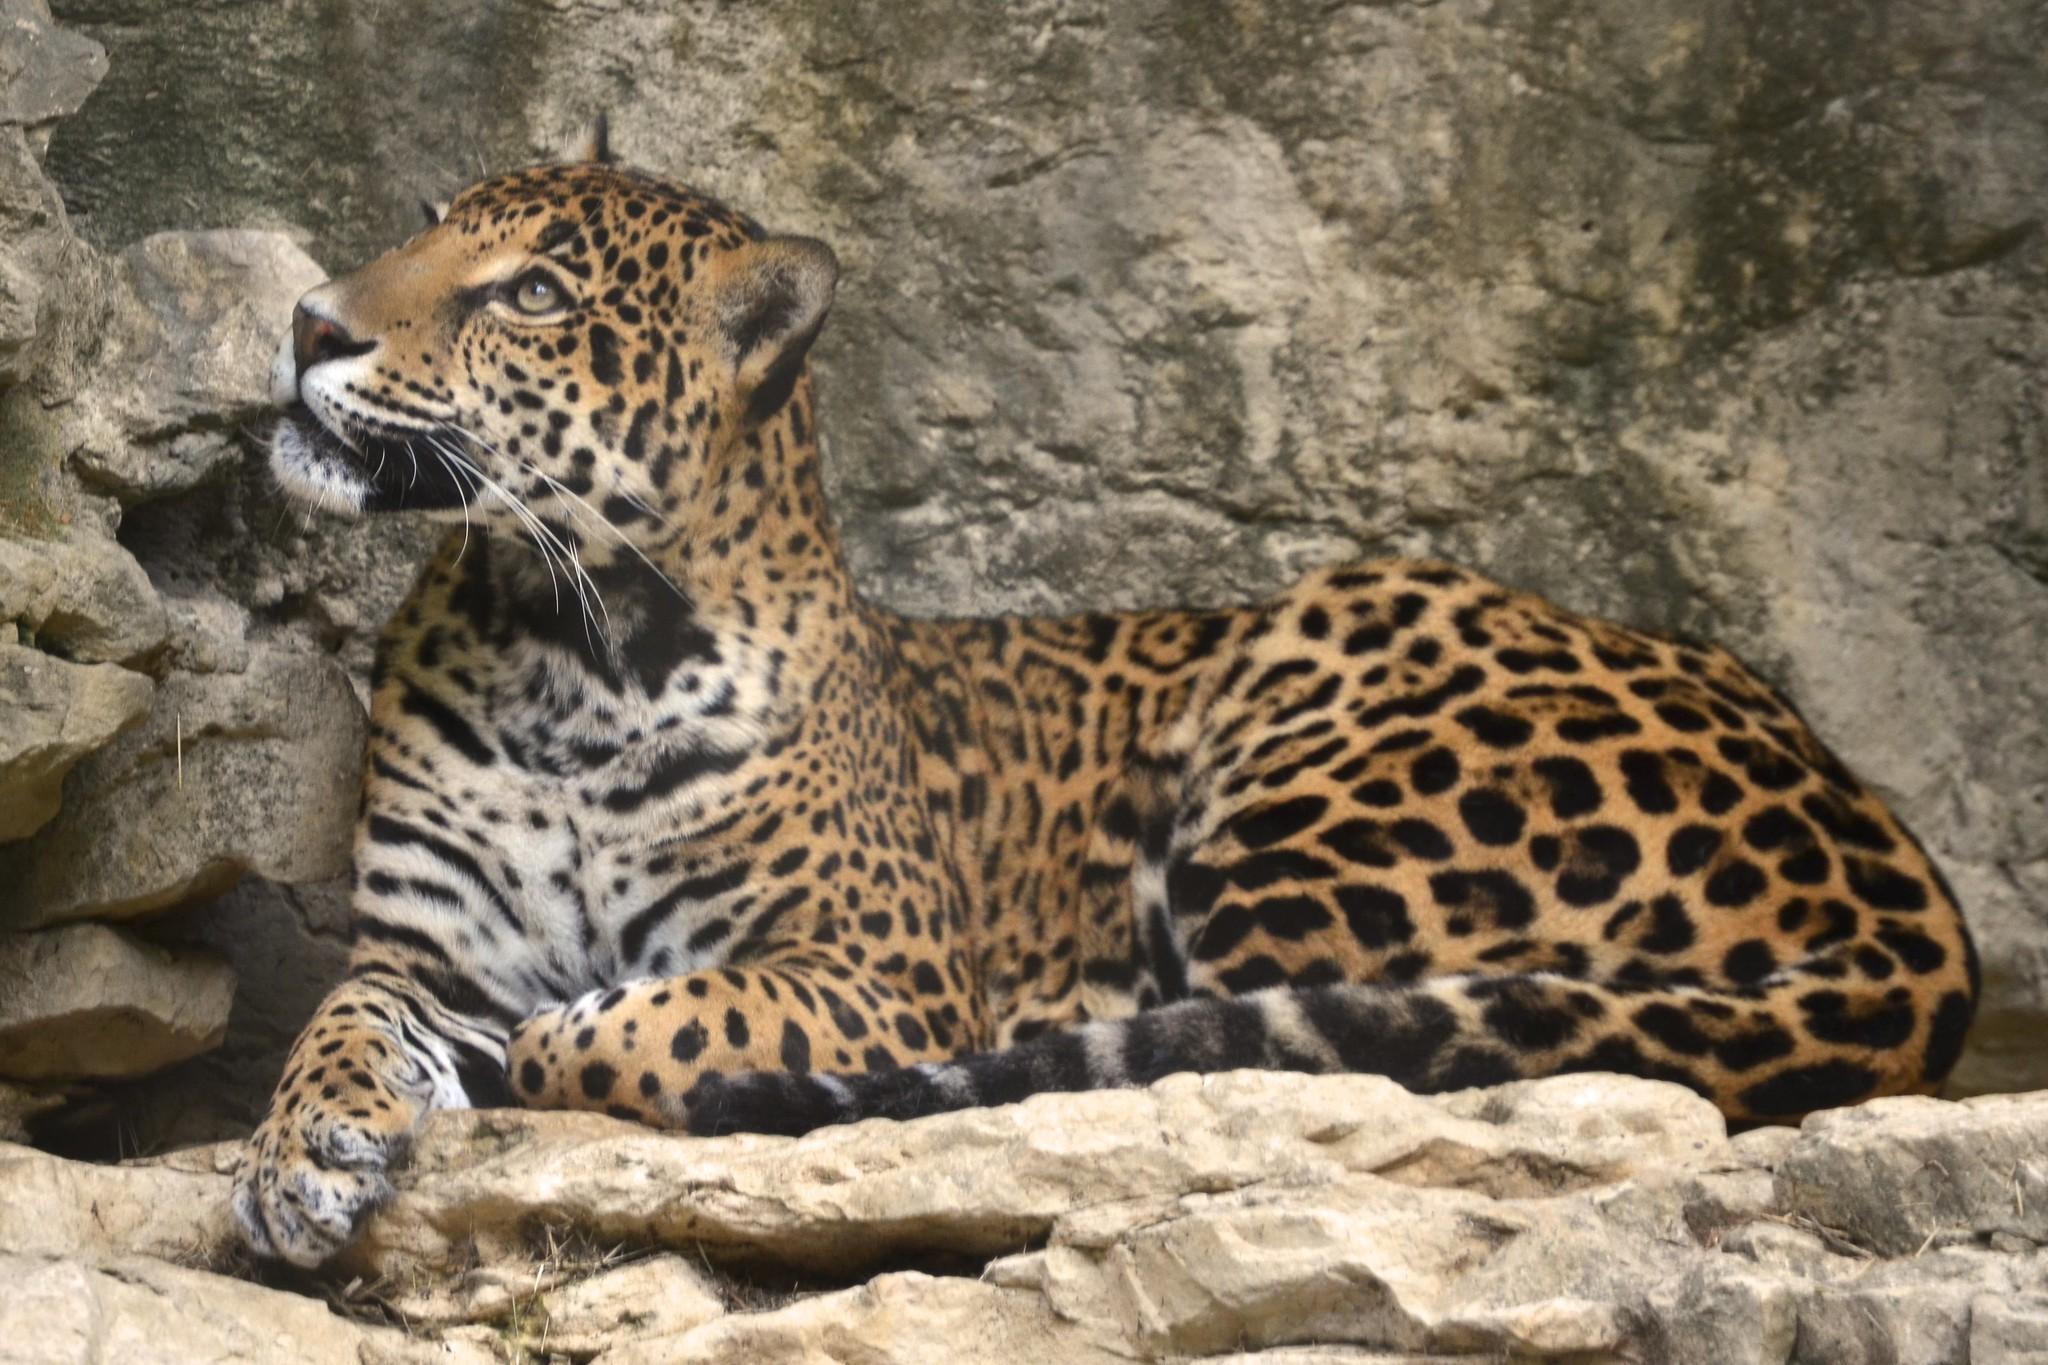 Big Cat Shootout - Lion vs Tiger vs Mountain Lion vs Jaguar vs